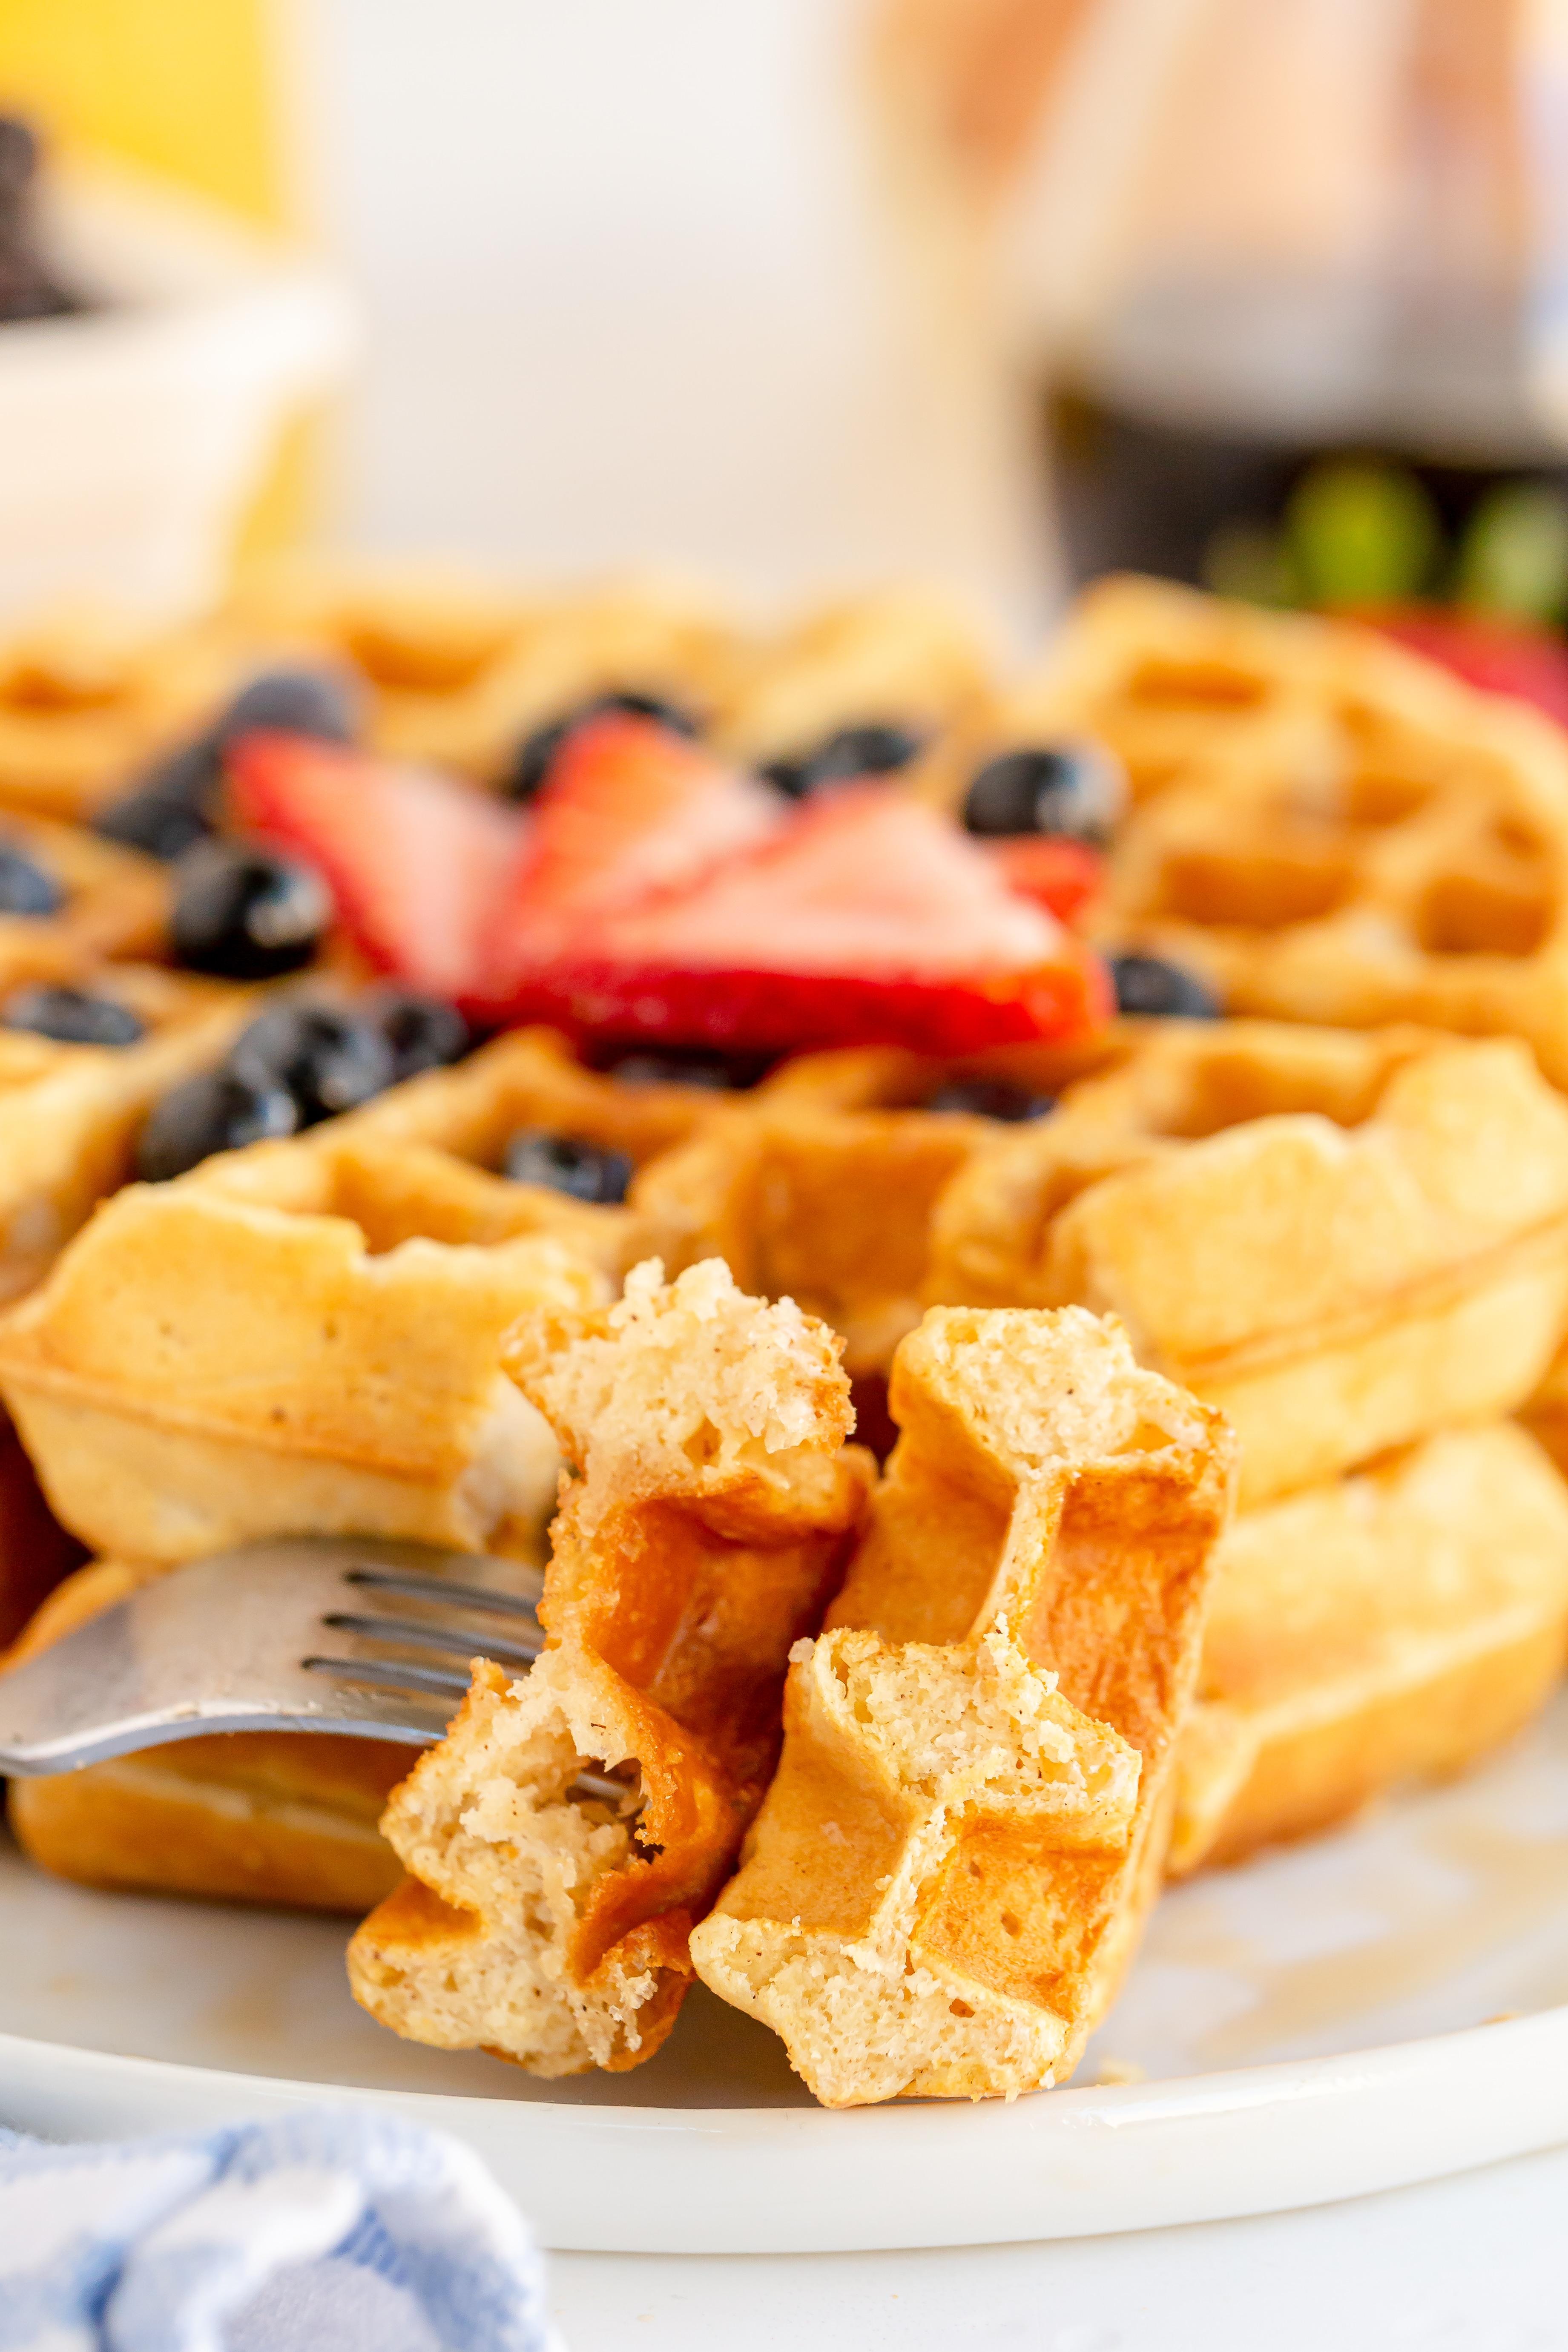 bite of homemade waffles